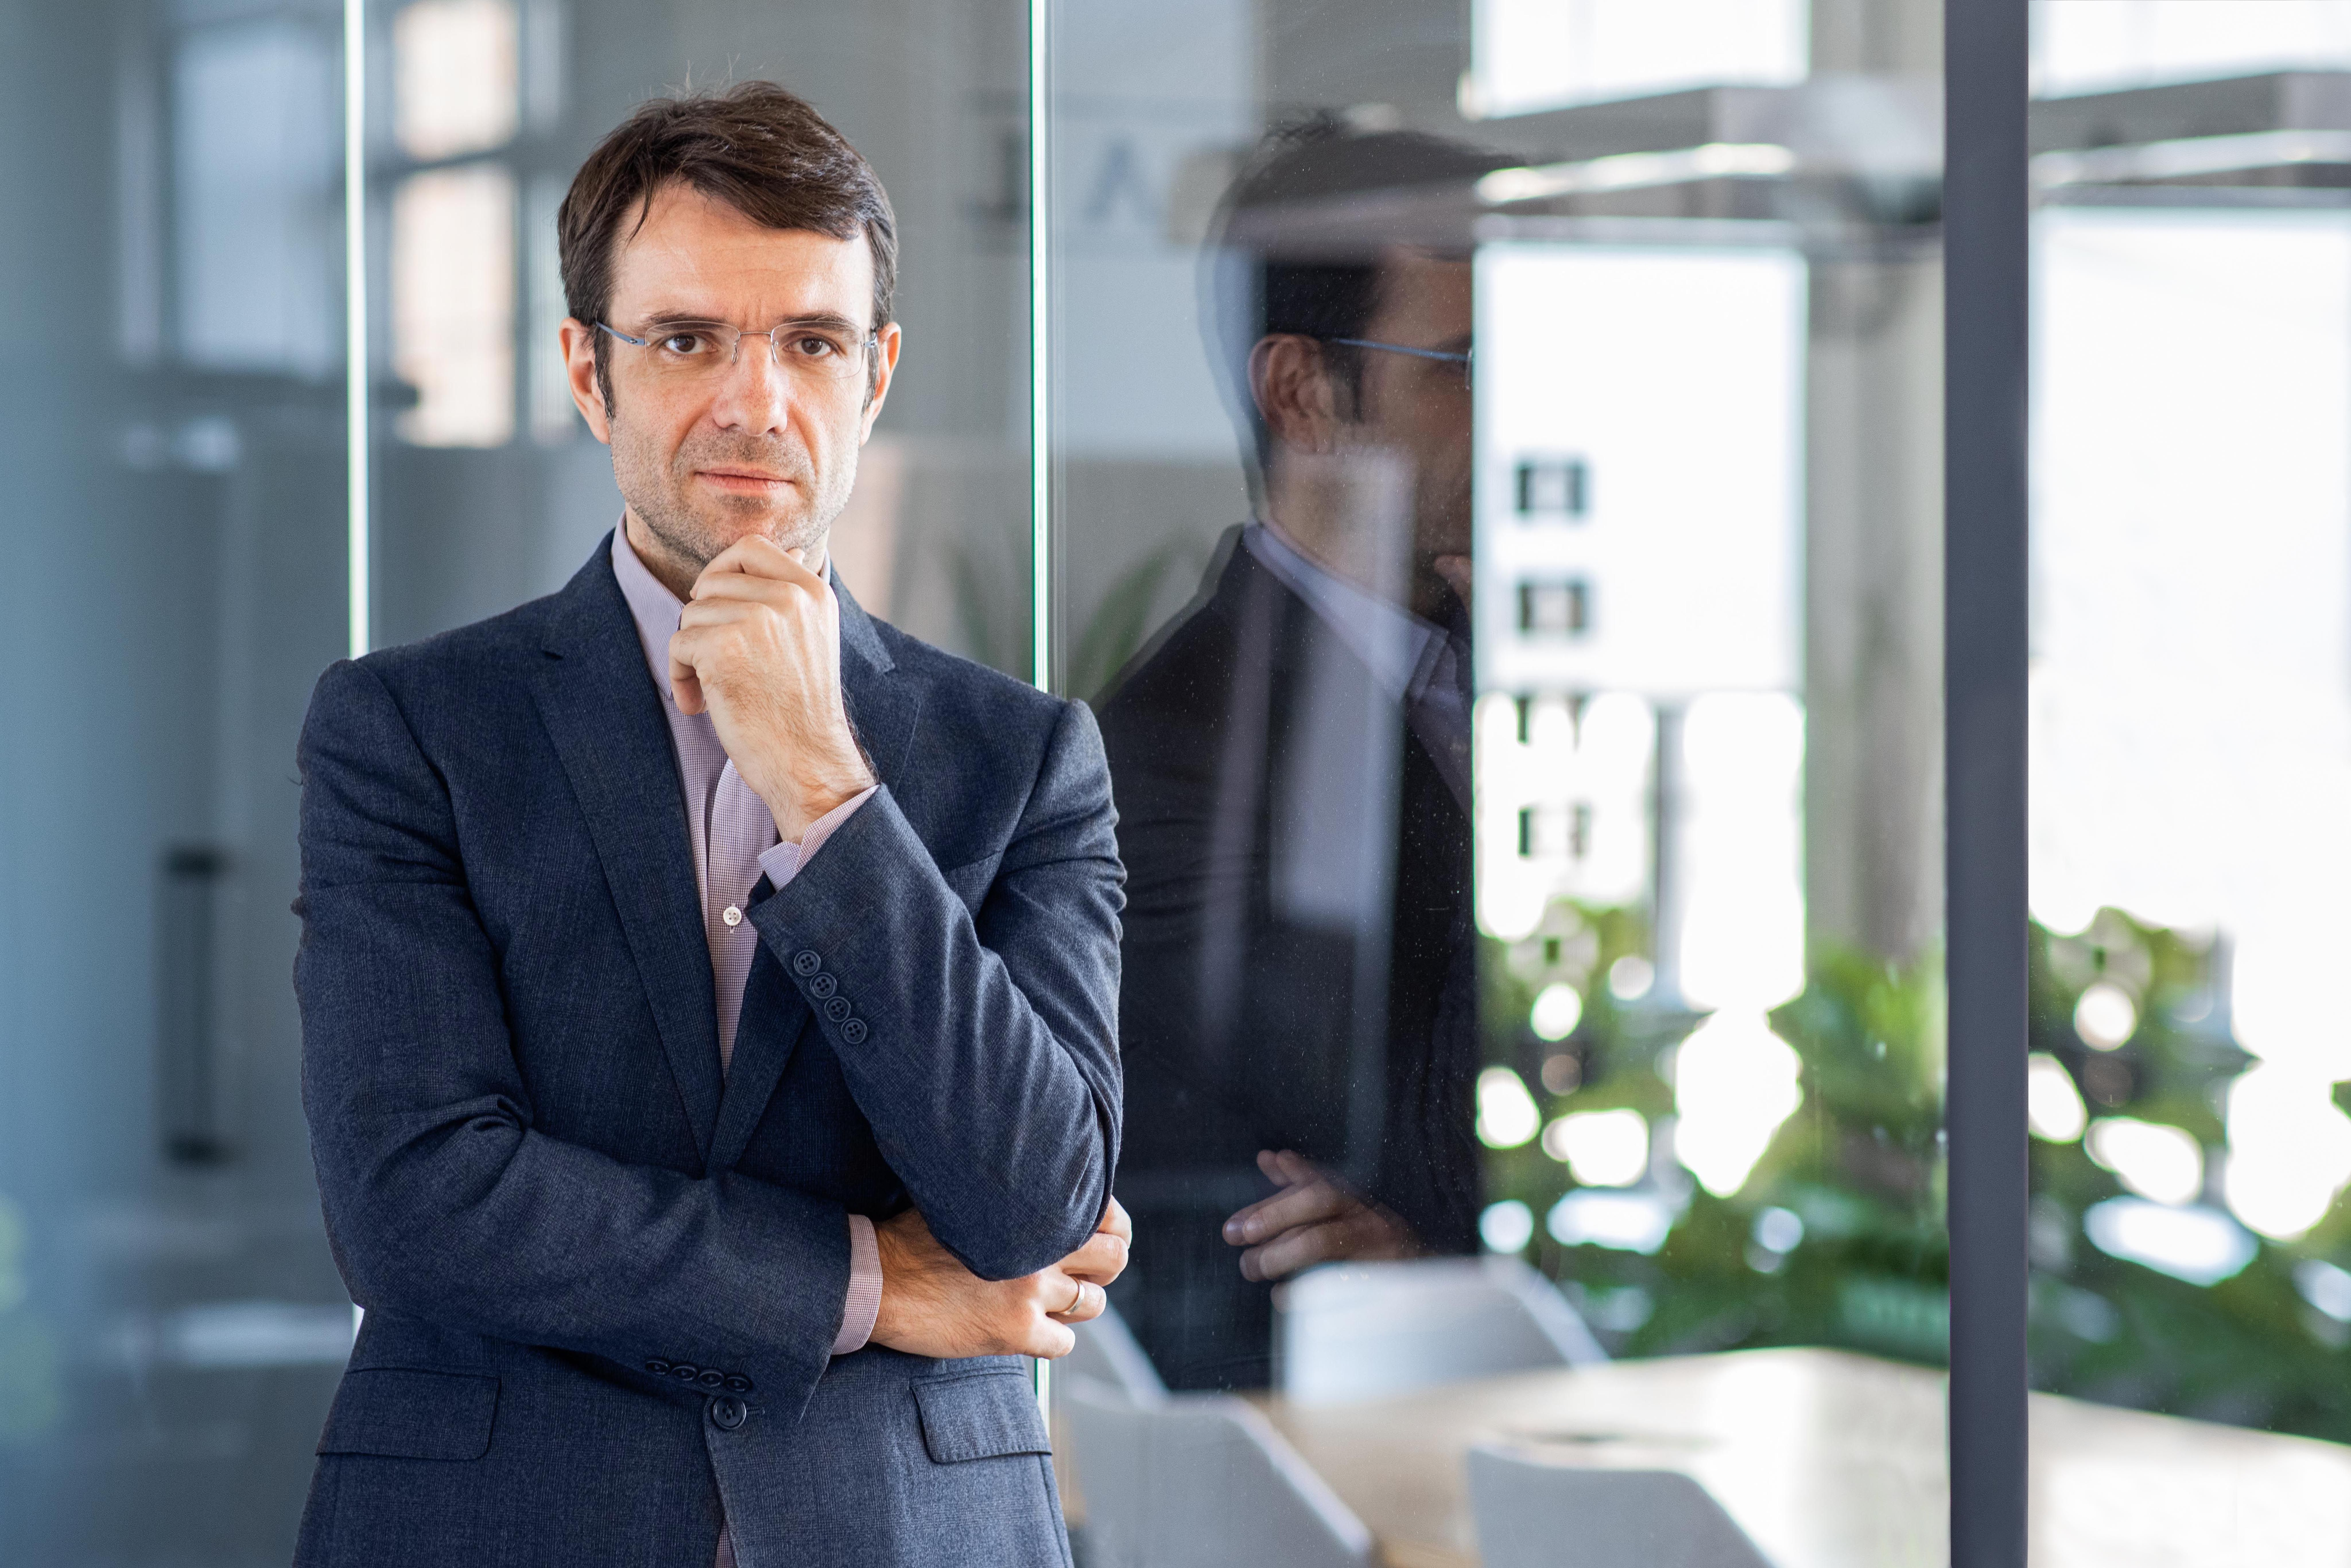 NaturalAntibody appoints ex-AstraZeneca CFO Jakob Saga as Chief Commercial Officer